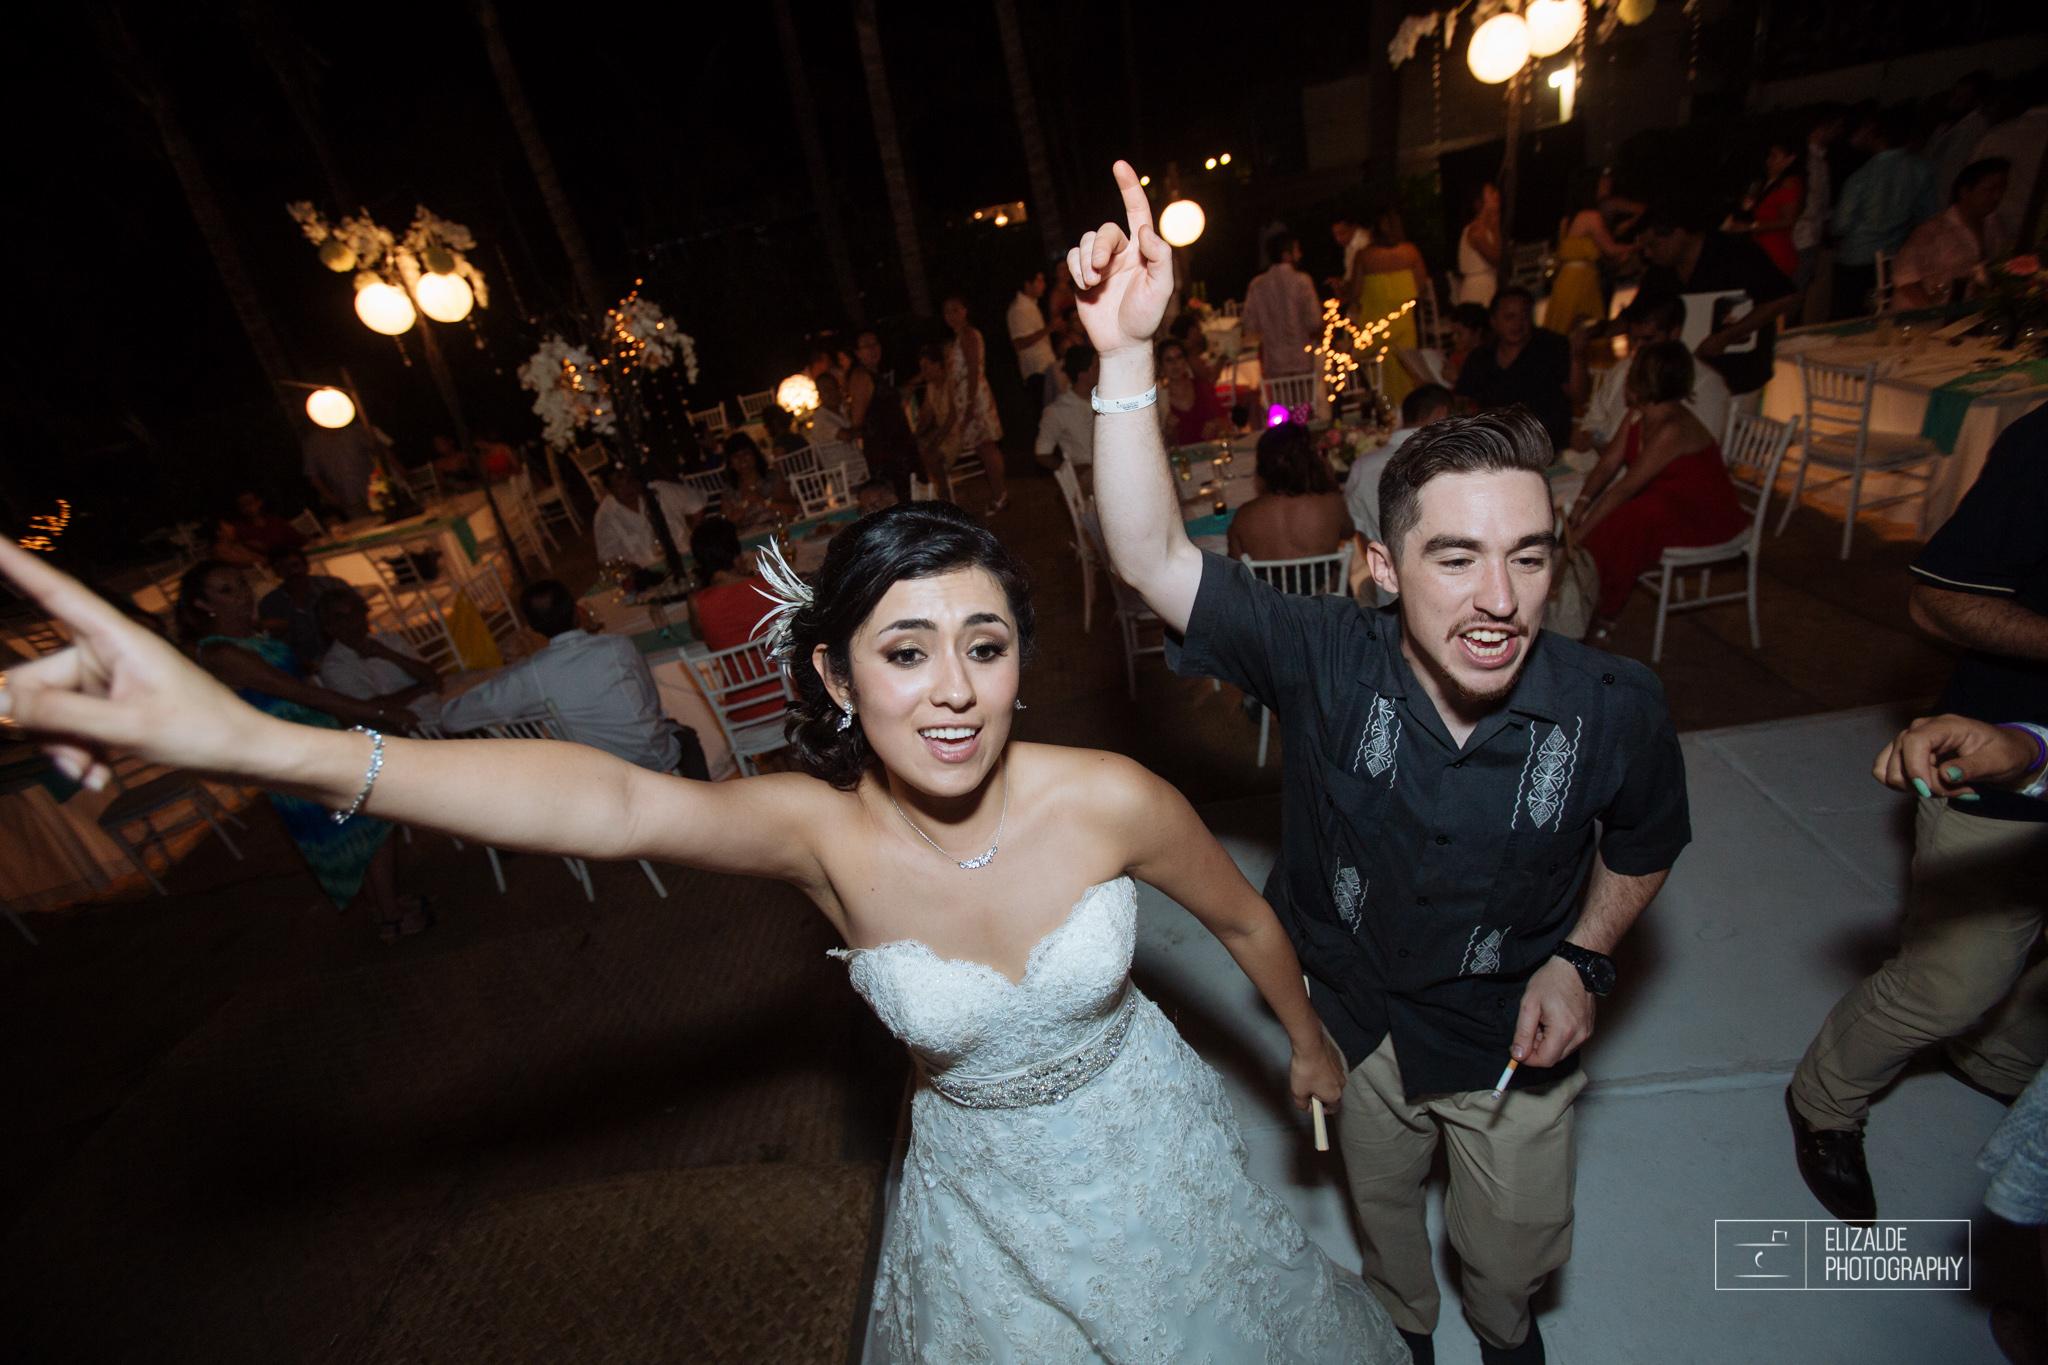 Pay and Ferran_Acapulco_Destination Wedding_Elizalde Photography-125.jpg